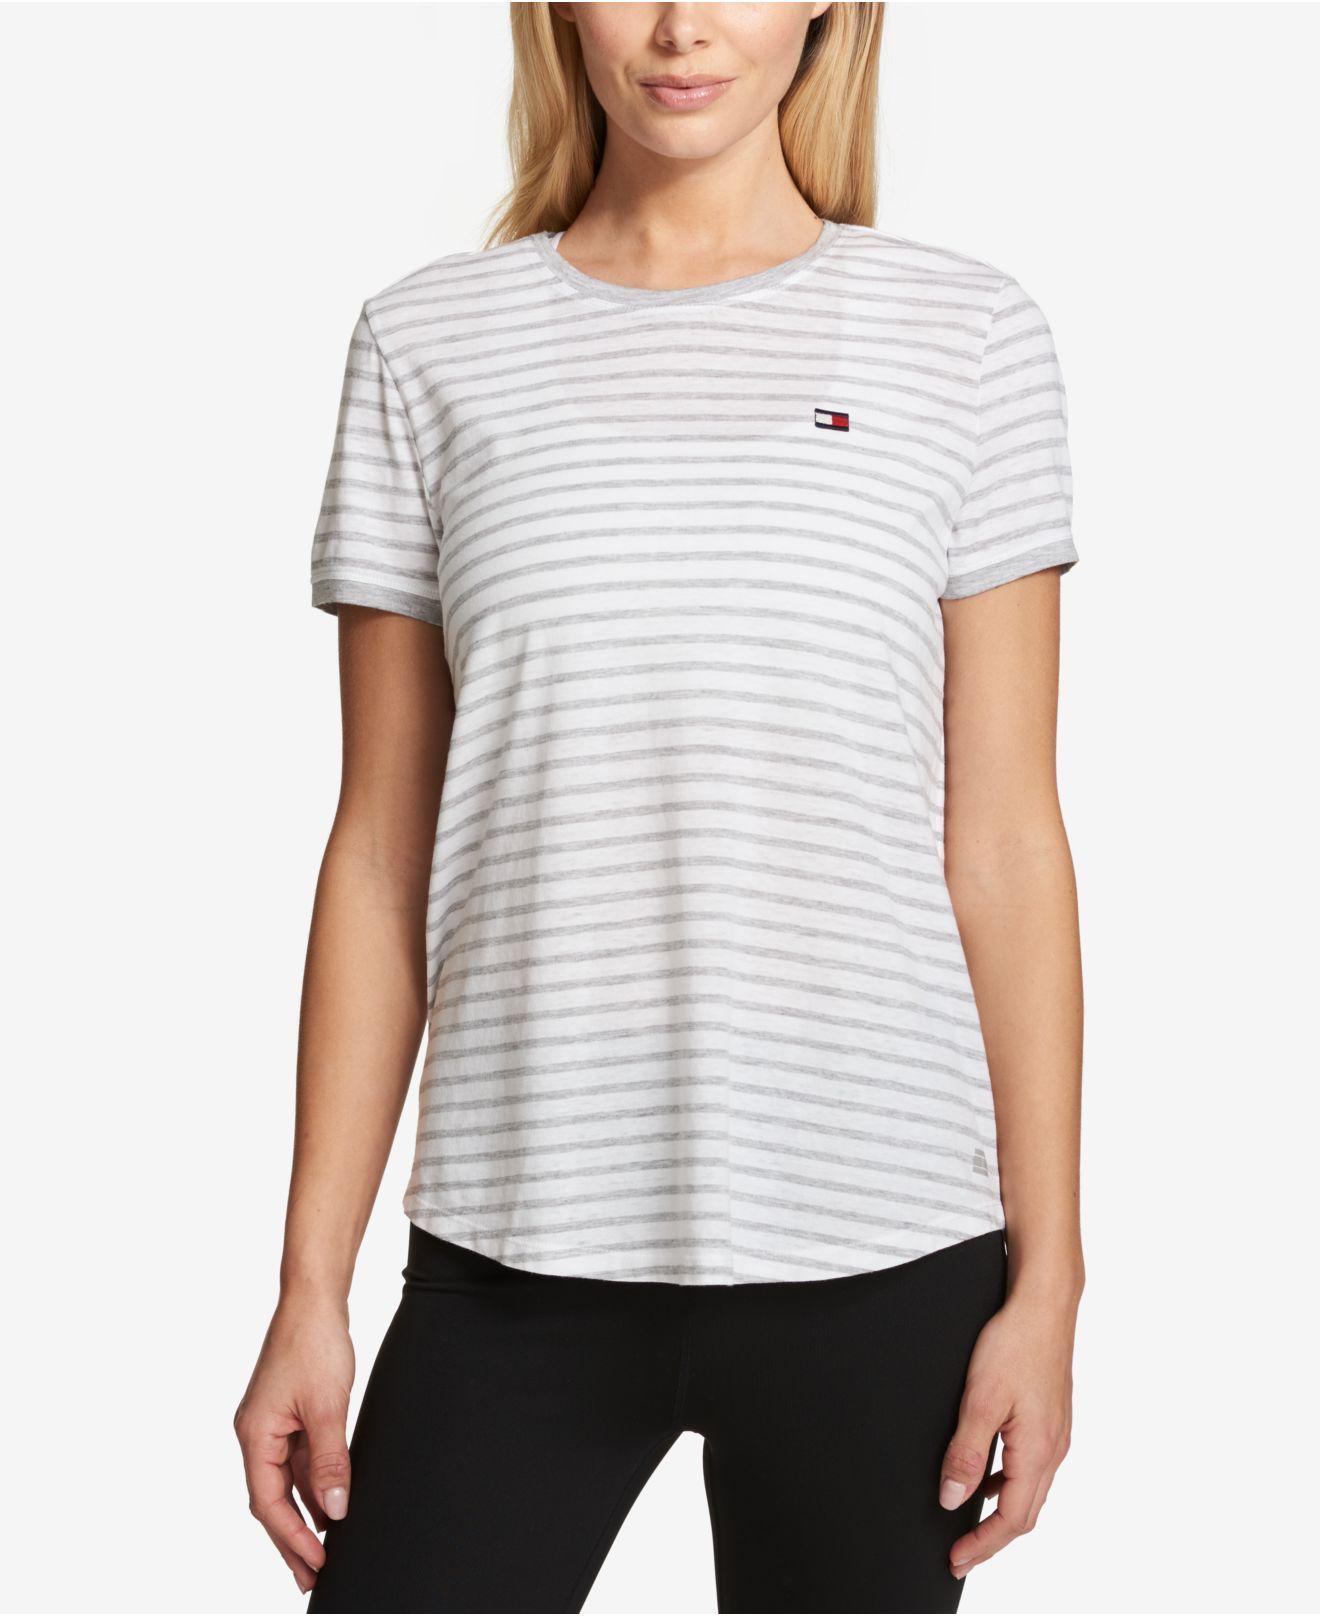 96446cddfbd7d Macys Tommy Hilfiger Womens Shirts